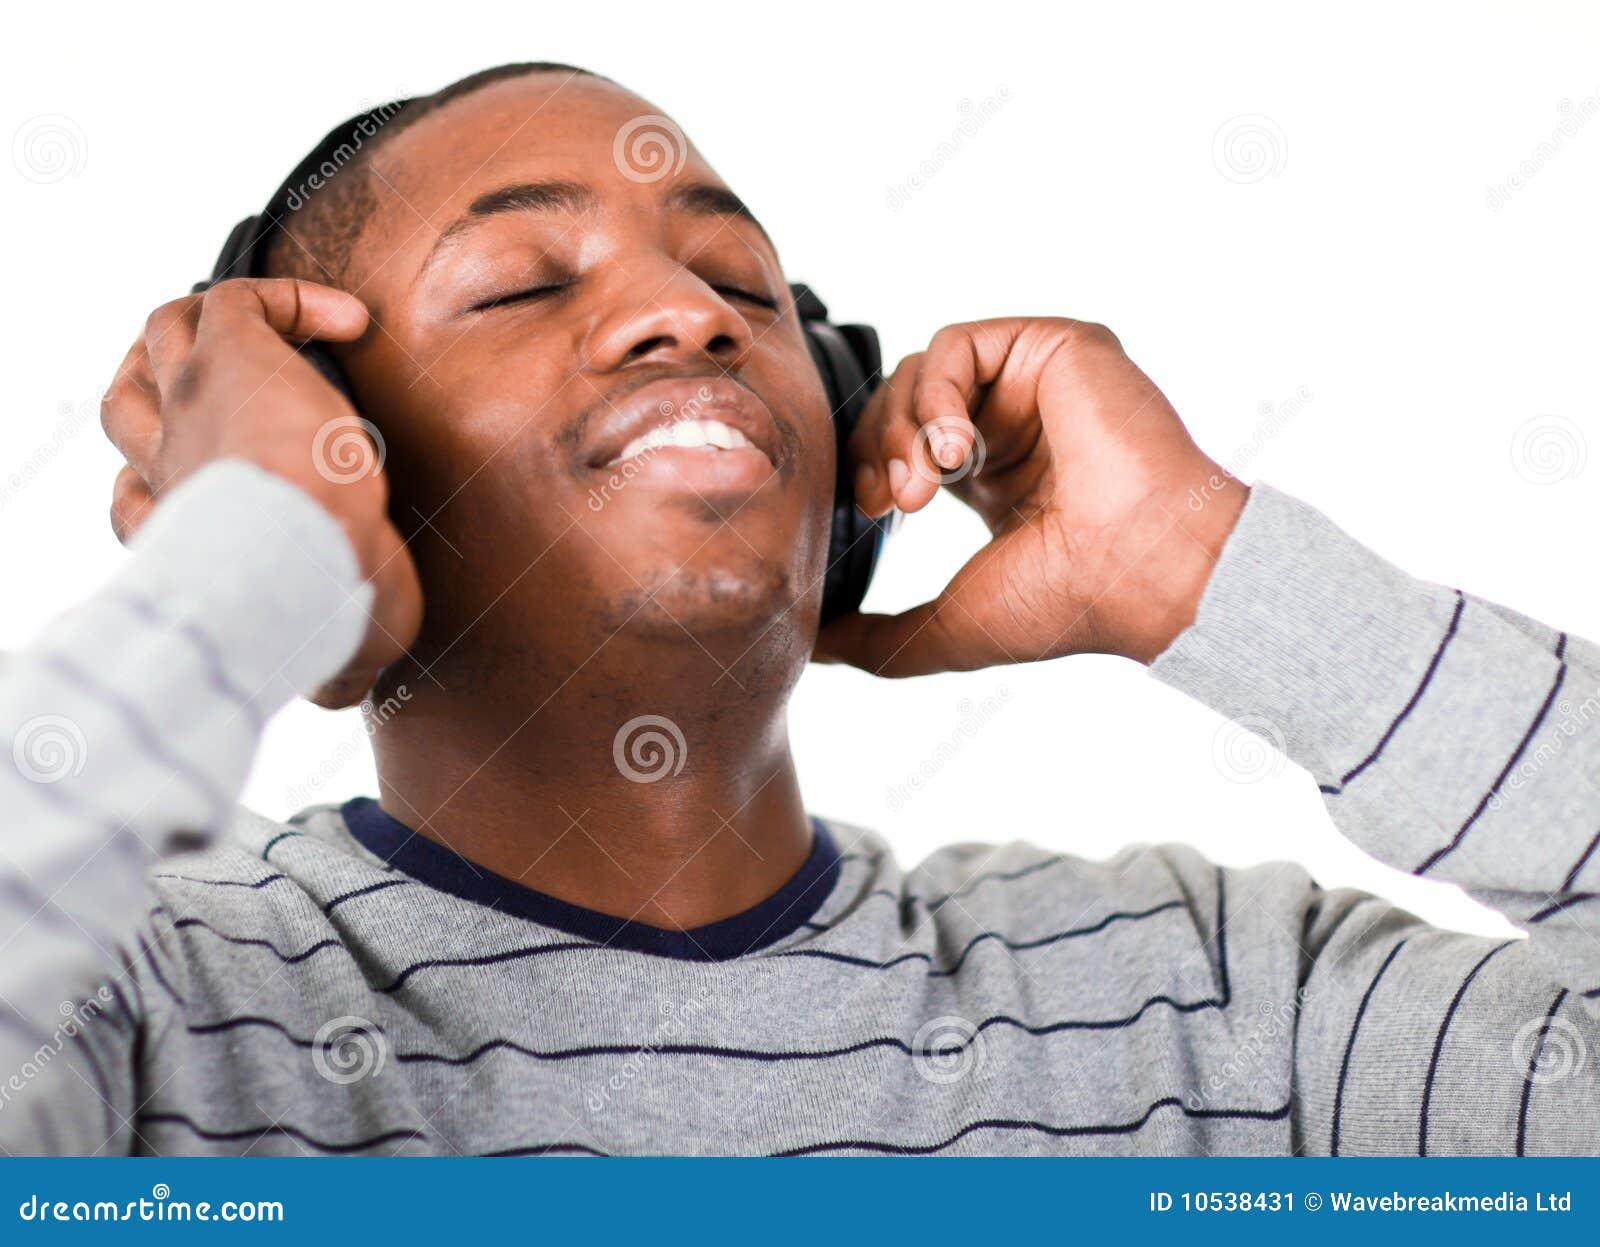 Adult Listening 25